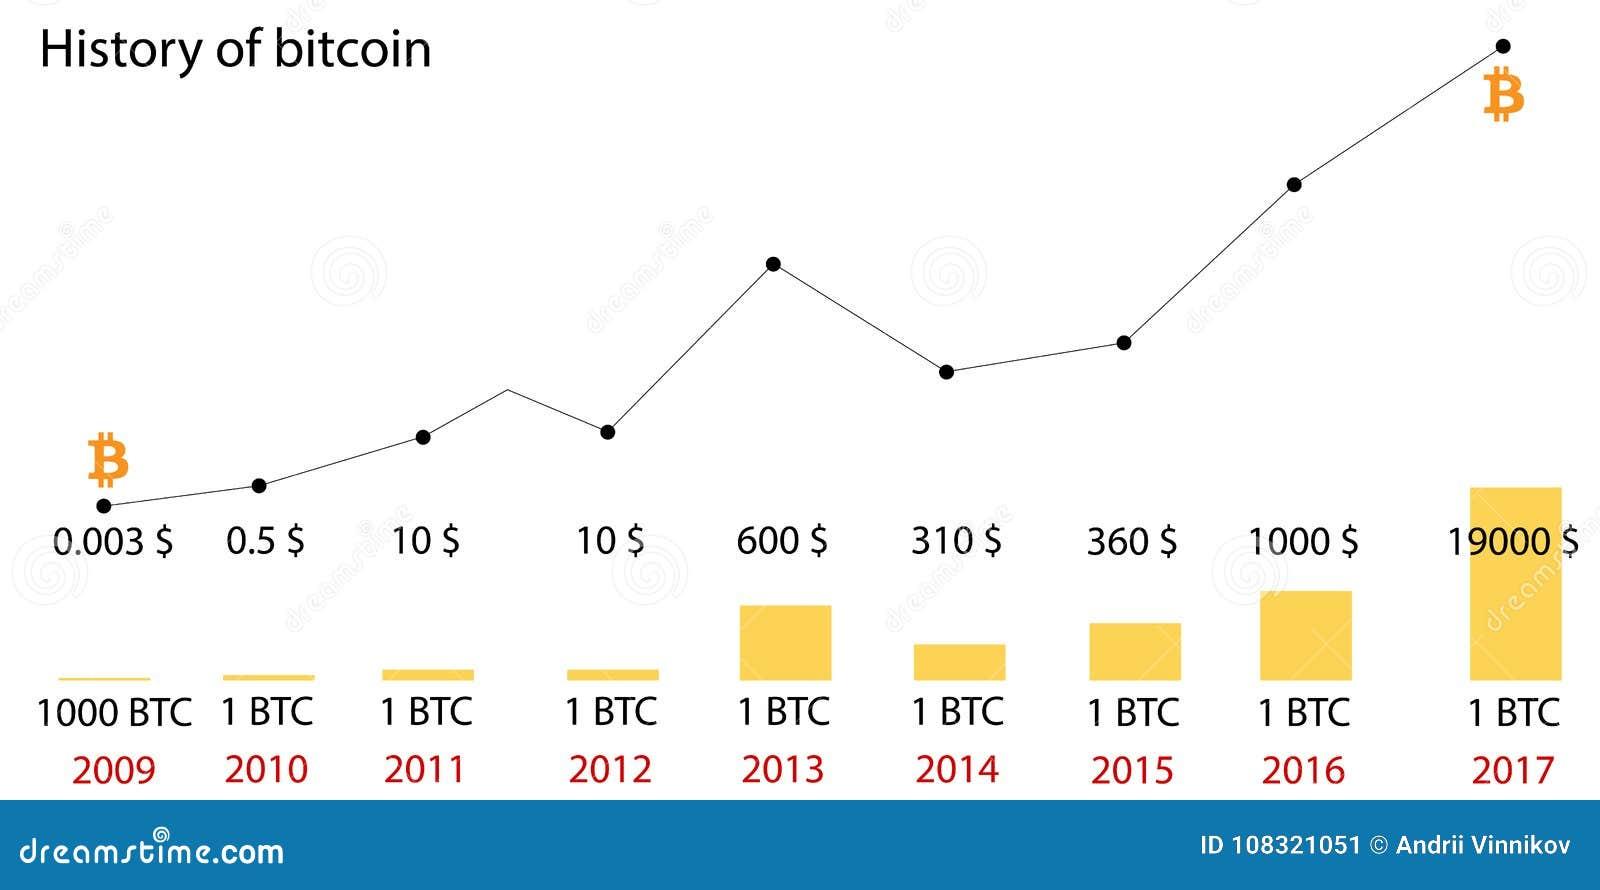 ing criptomoeda comercial preço do bitcoin em 2009